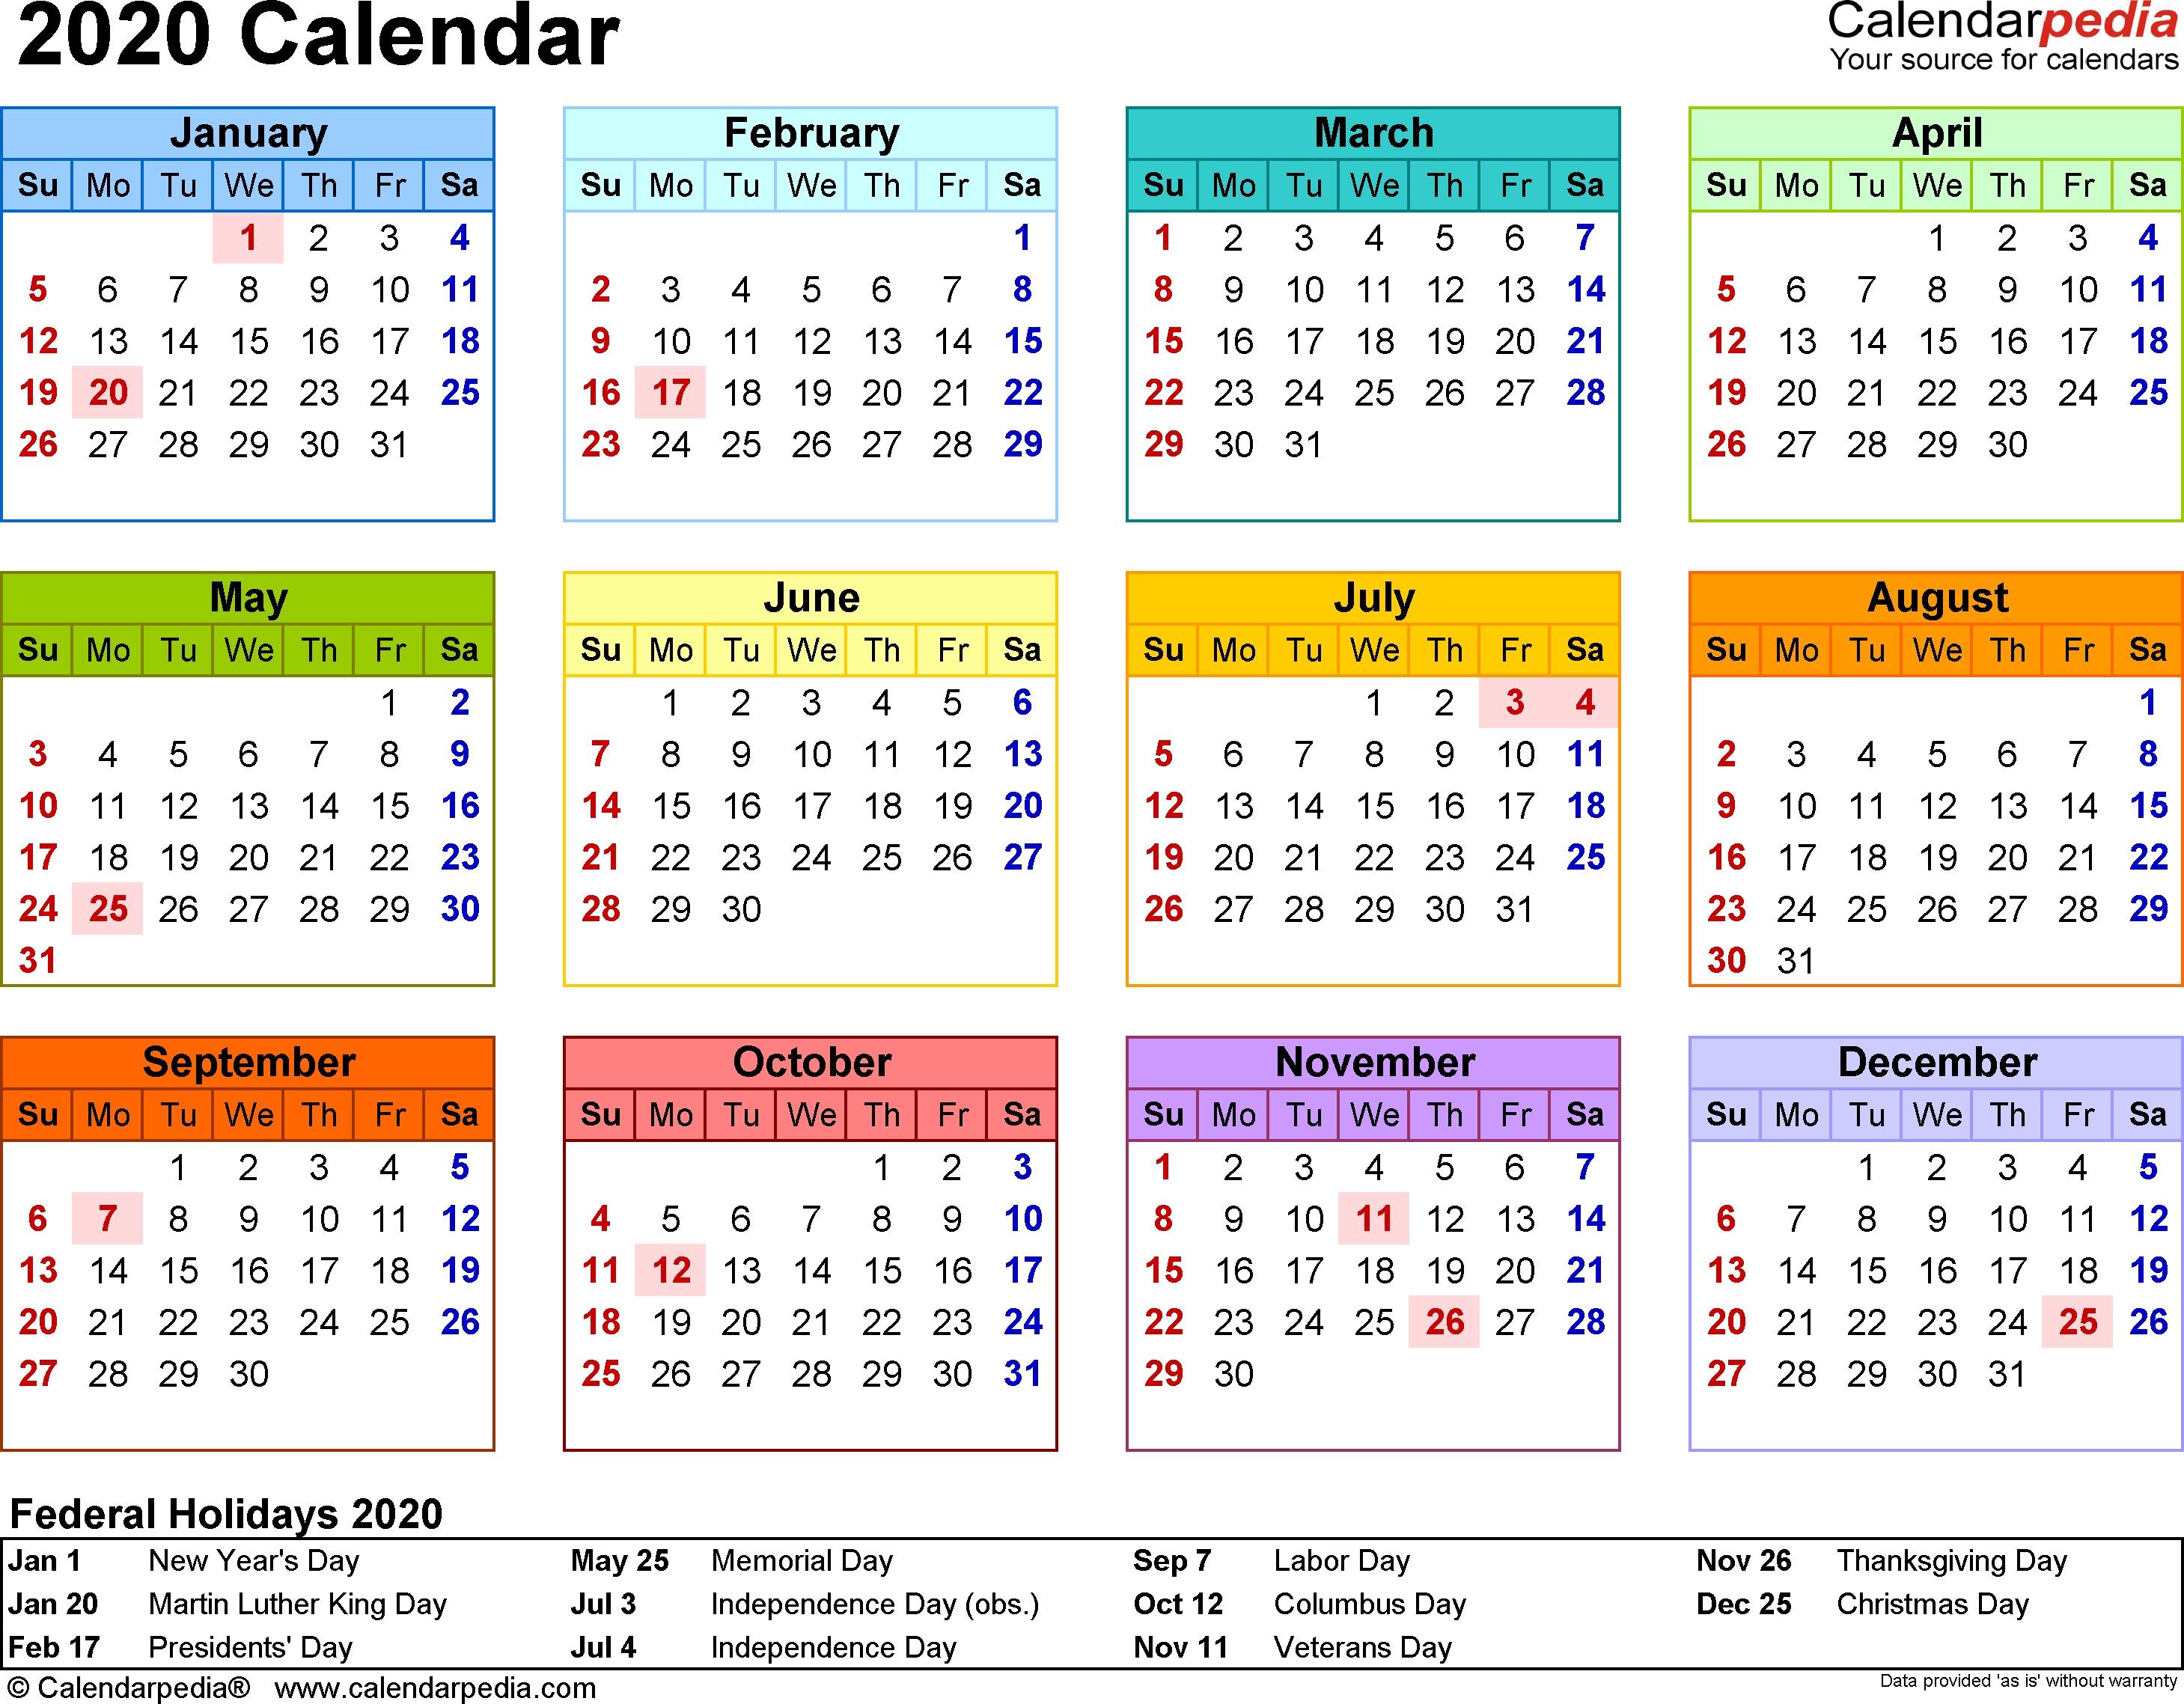 2020 Calendar - 18 Free Printable Word Calendar Templates-Printable Calendar 2020 With Bank Holidays